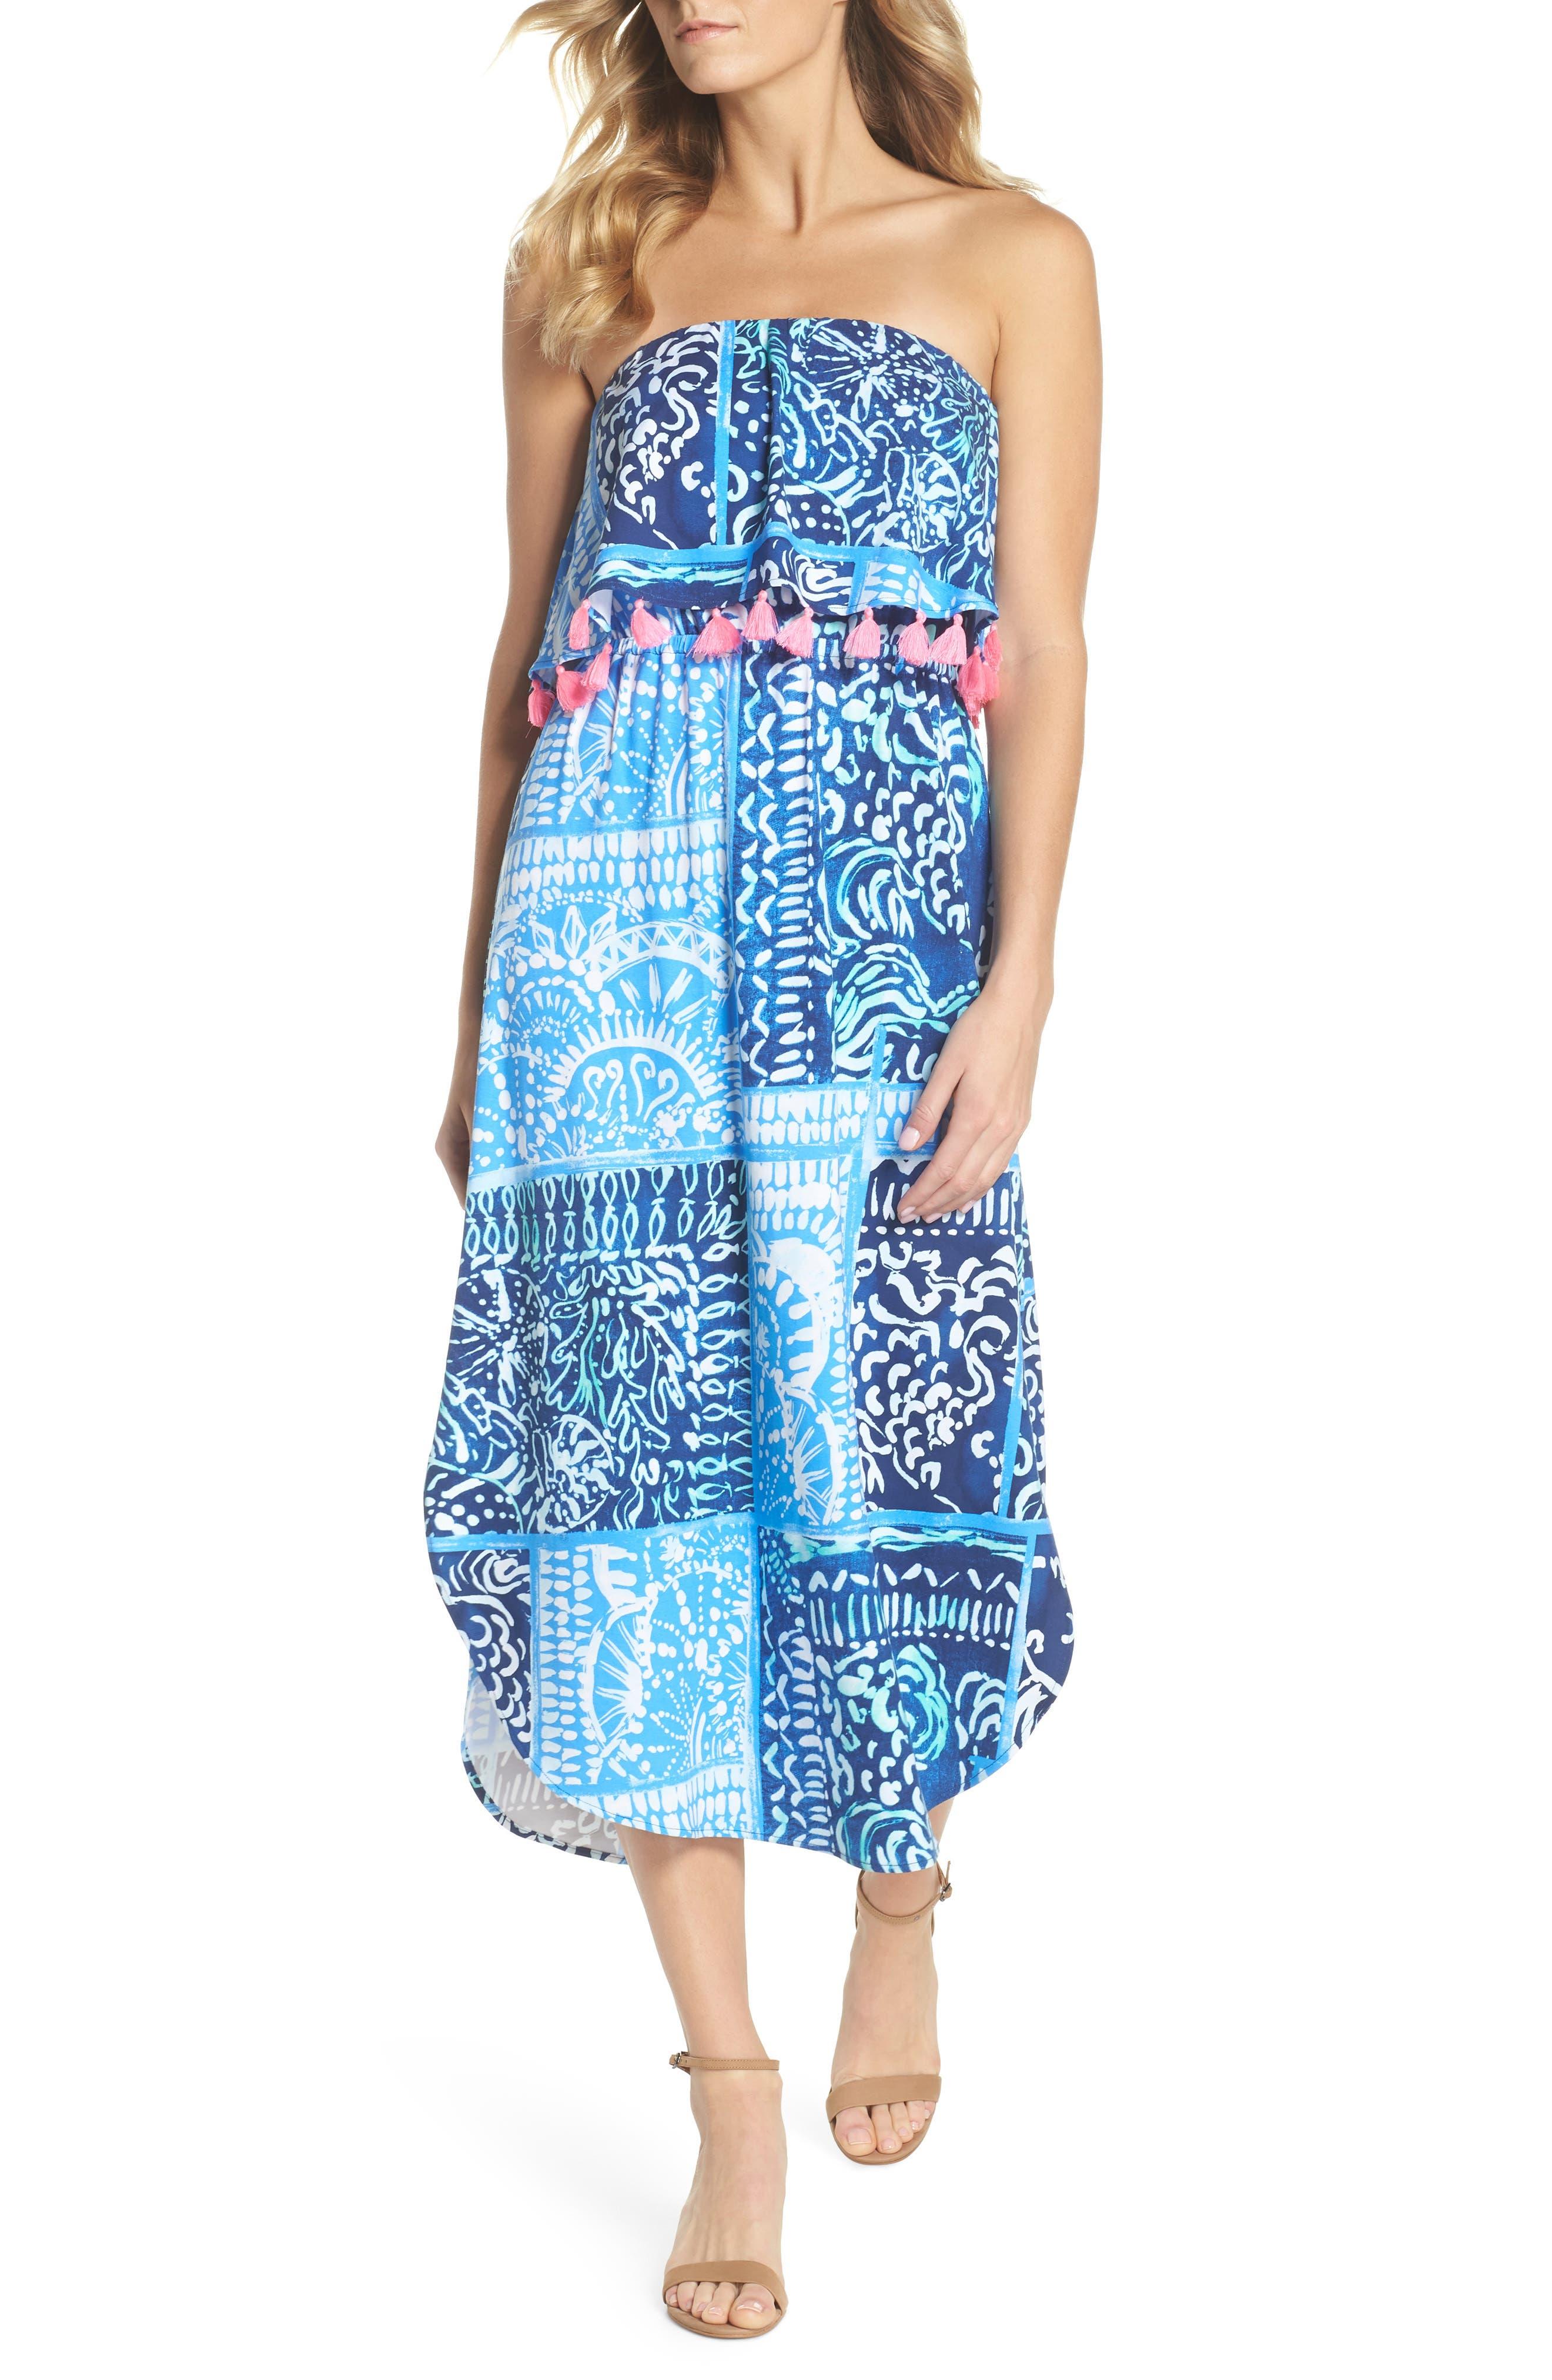 Meridian Strapless Midi Dress,                             Main thumbnail 1, color,                             Deep Indigo Leid Back